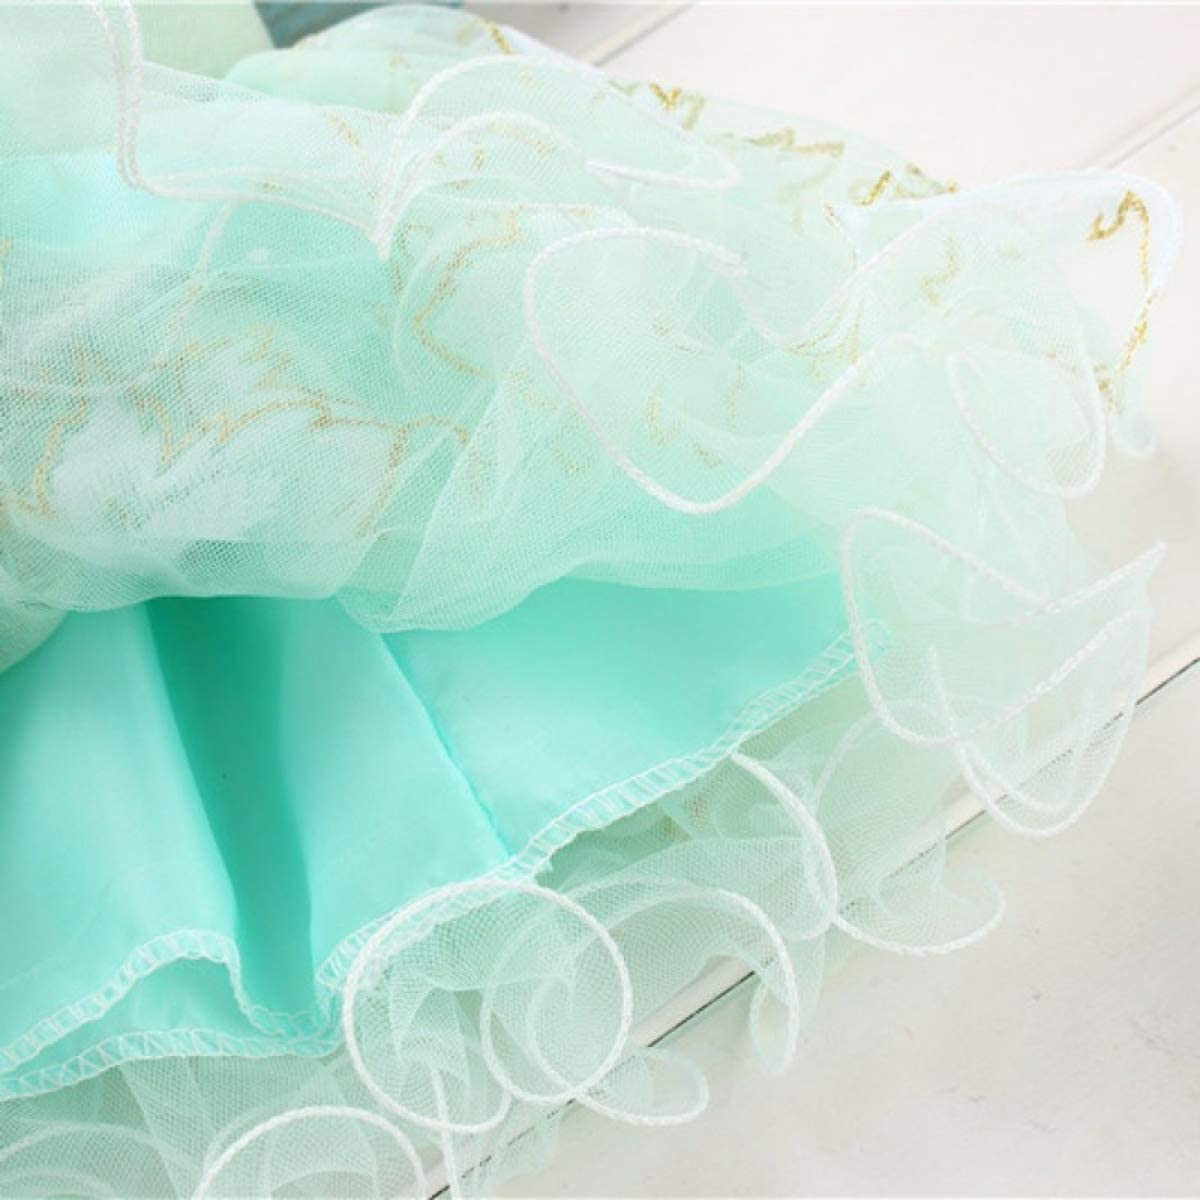 Girls Baby Tutu Skirts Pink Tulle Puffy Skirts Toddler Infant Short Cake Skirt Children Princess